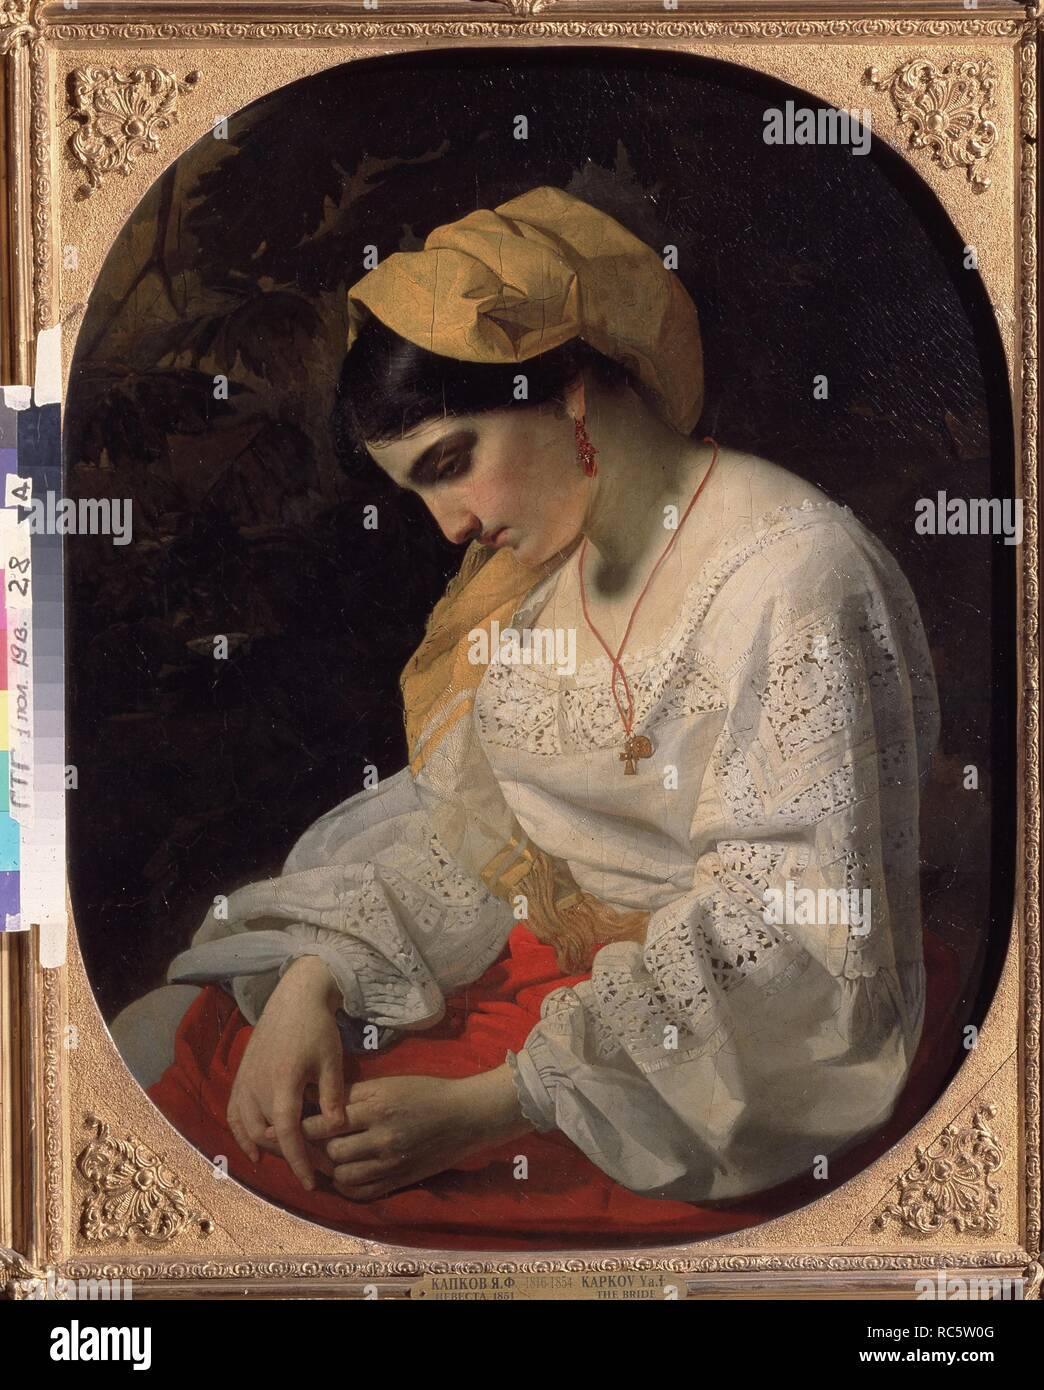 A Bride. Museum: State Tretyakov Gallery, Moscow. Author: Kapkov, Yakov Fyodorovich. Stock Photo